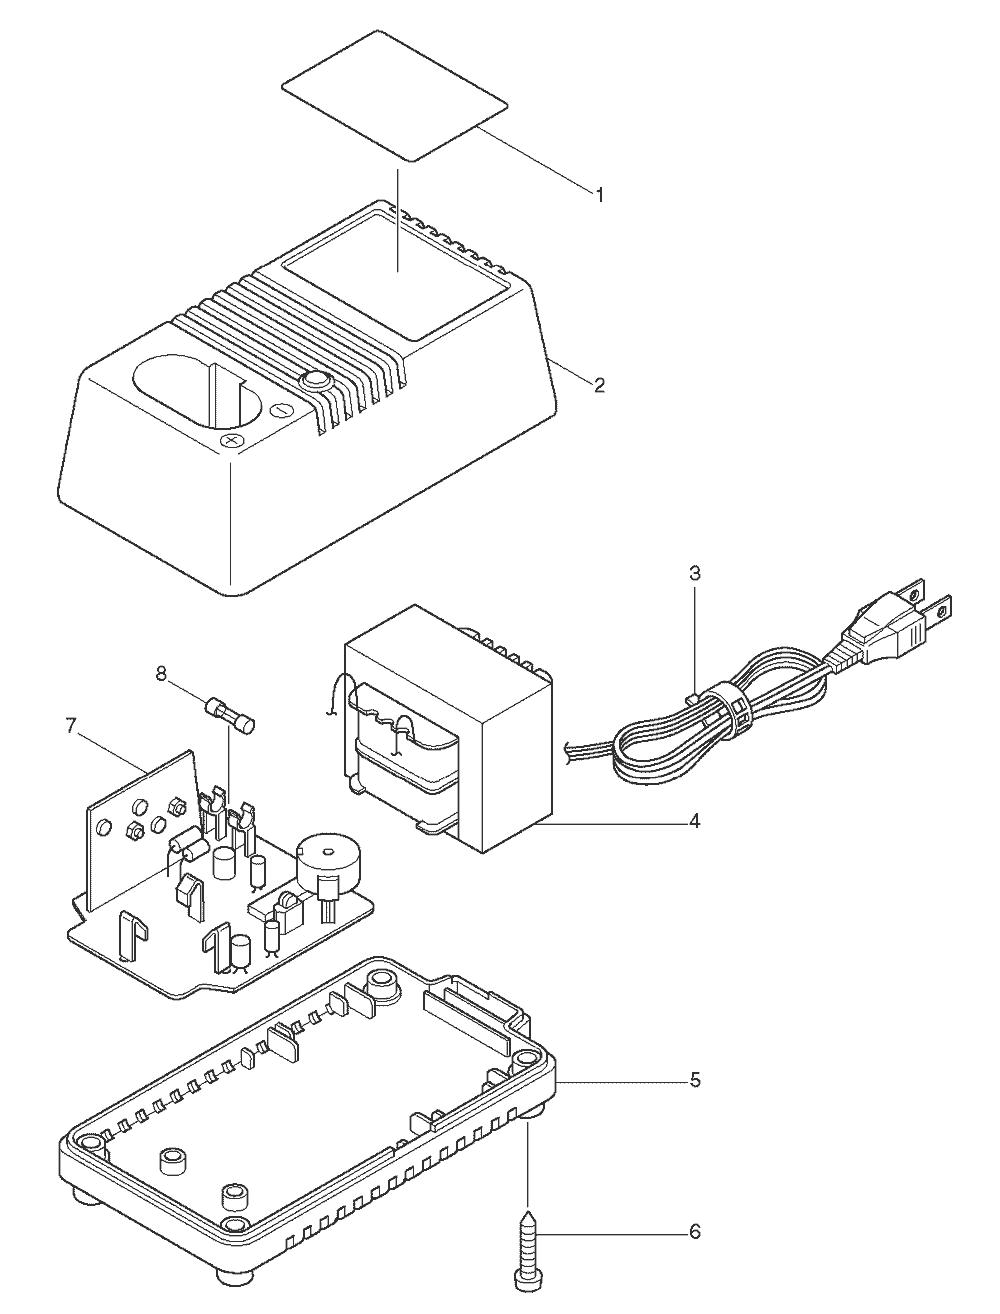 medium resolution of makita dc1201 parts schematic